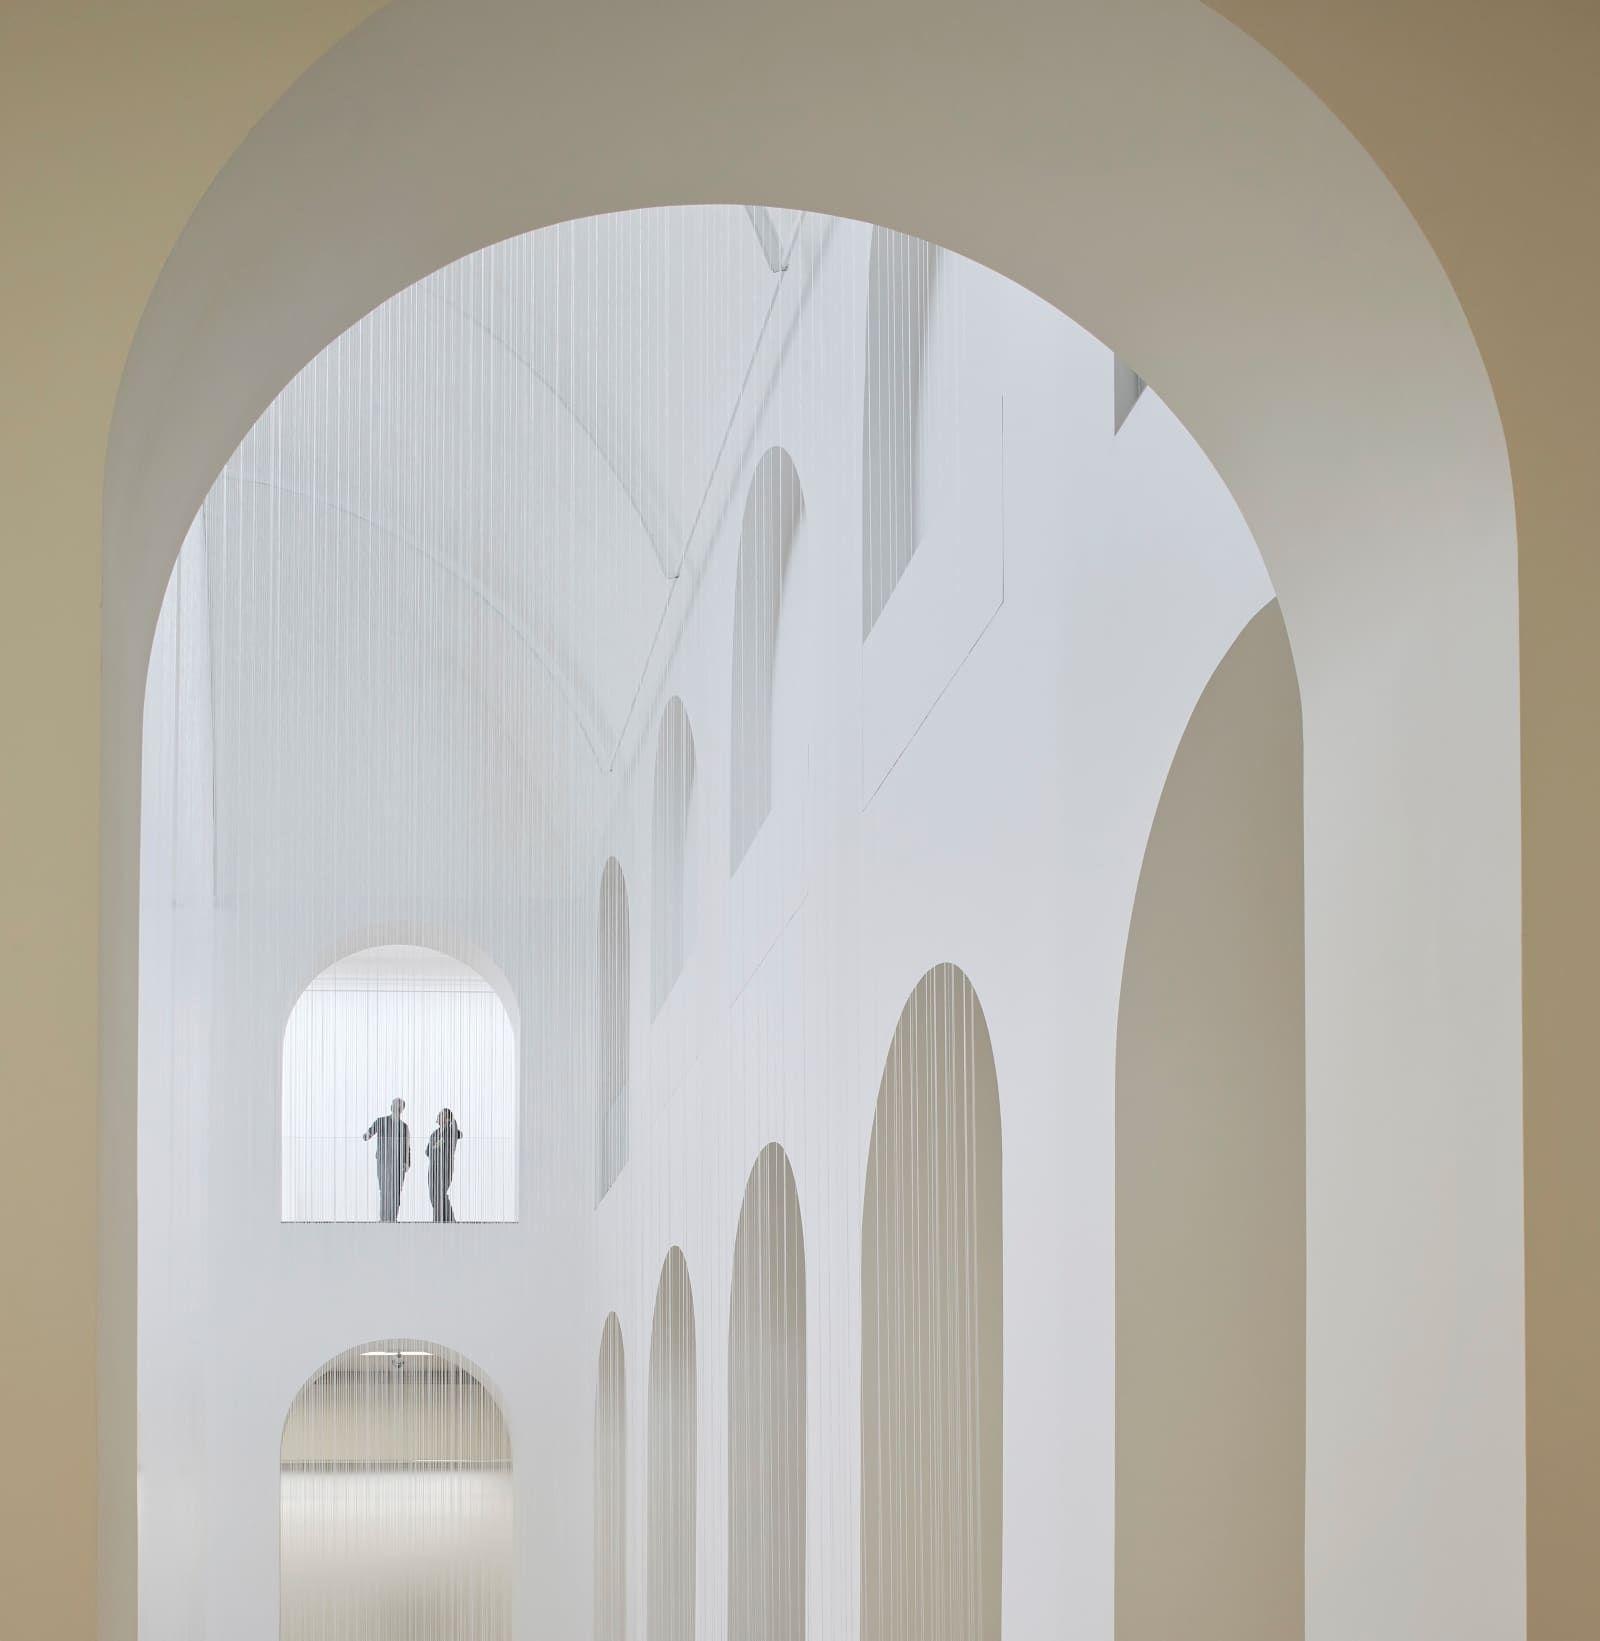 Stanton Williams, Hufton + Crow, Stefano Graziani · Musée d'Arts de Nantes